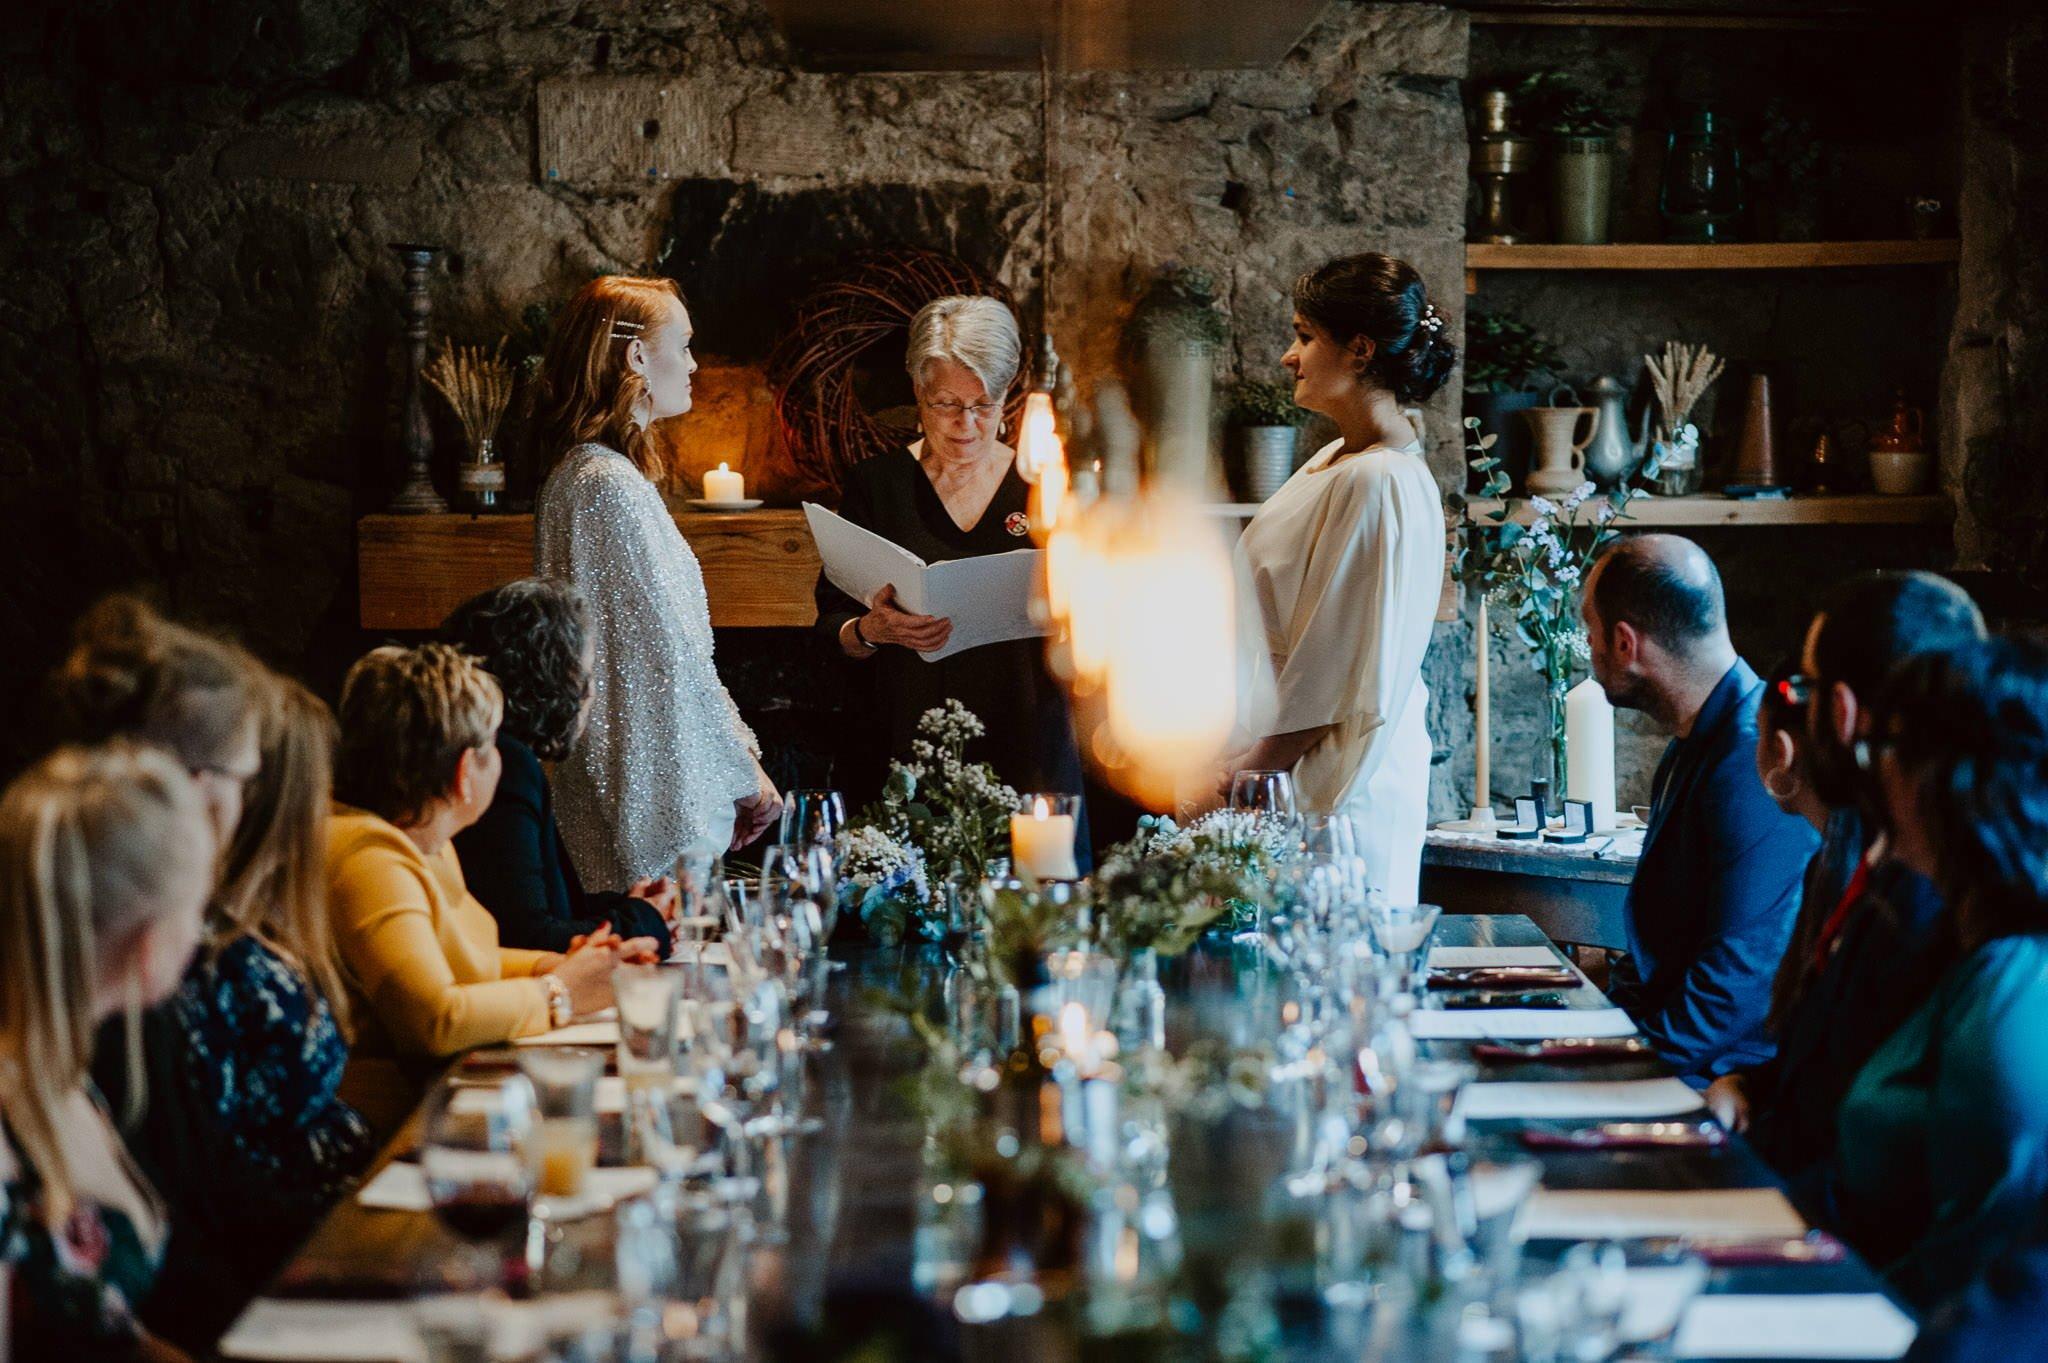 A Dreamy Pre-Raphaelite Wedding at the Bothy in Glasgow 23